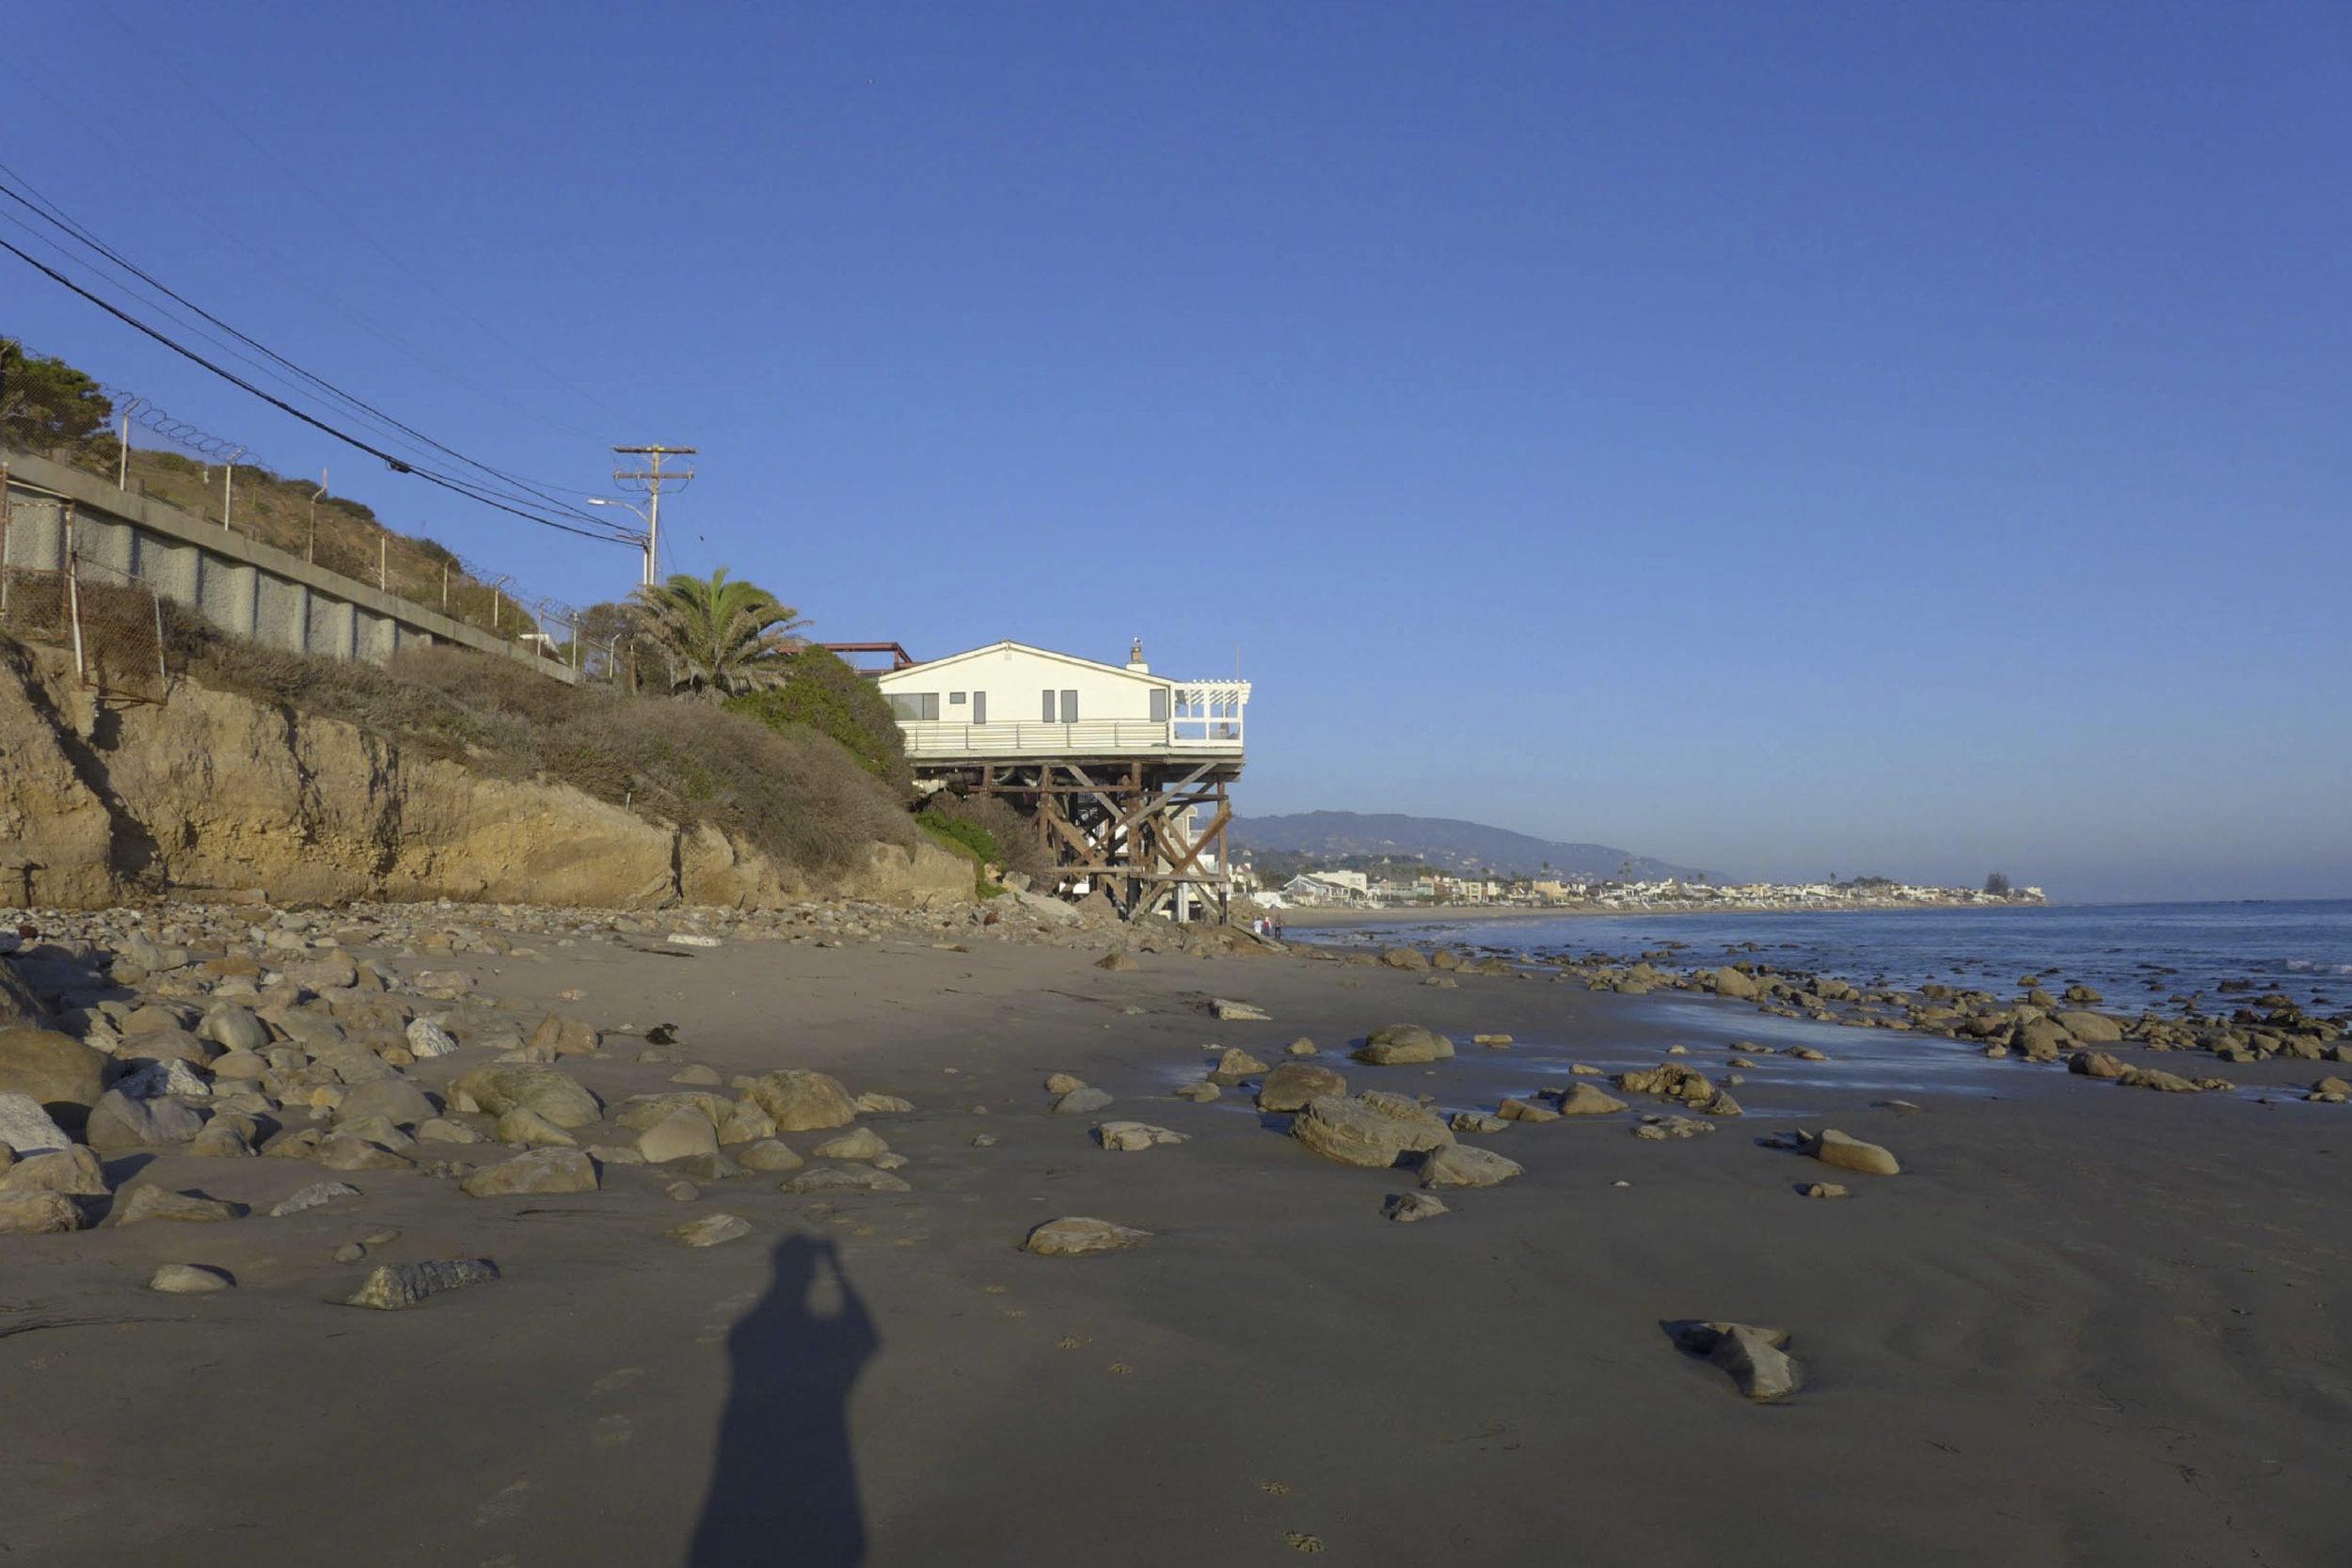 004 view study2 24024 Malibu Road Land For Sale.jpeg